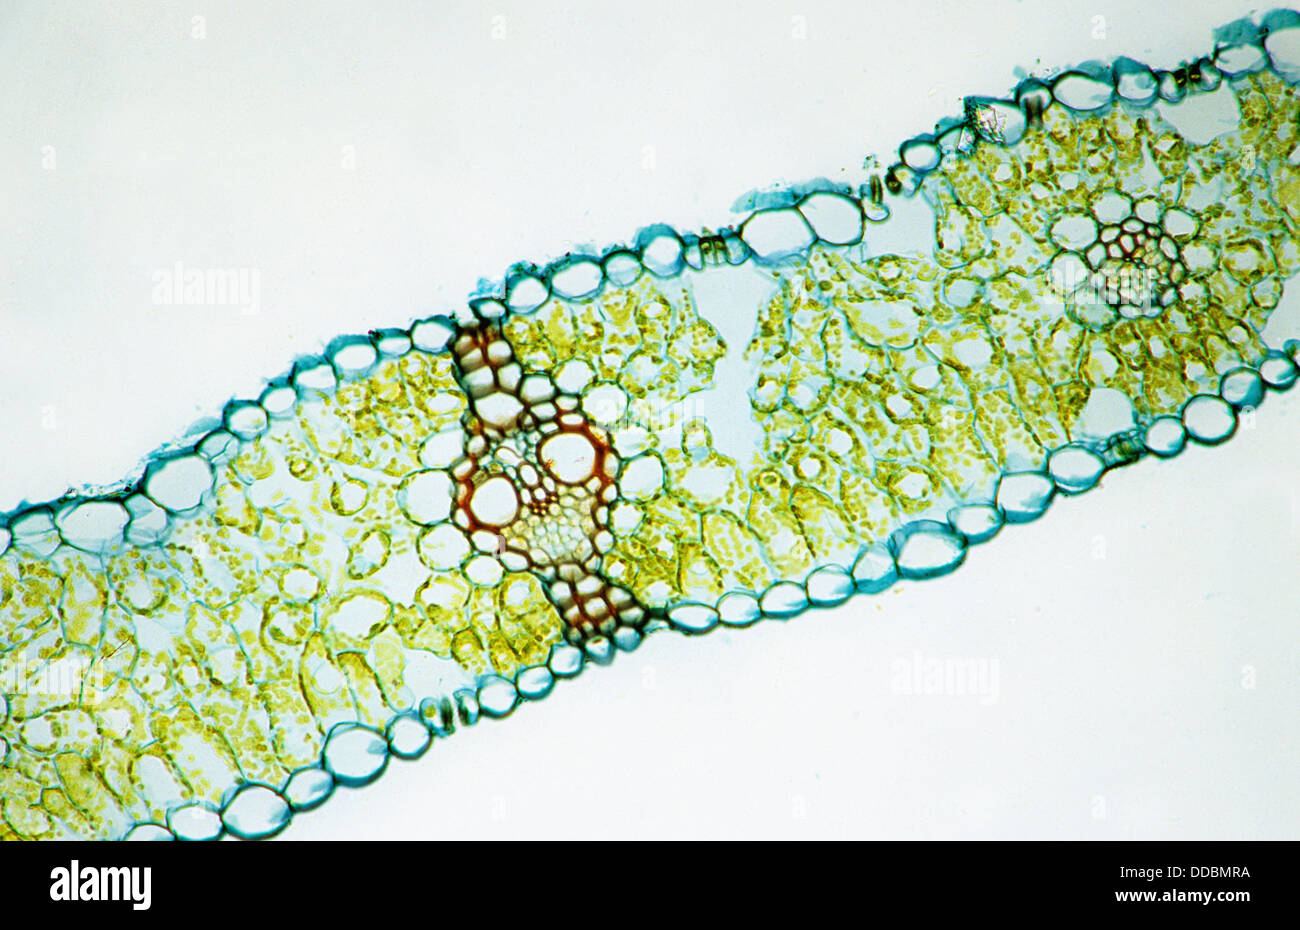 Monocotyledon Stockfotos & Monocotyledon Bilder - Alamy